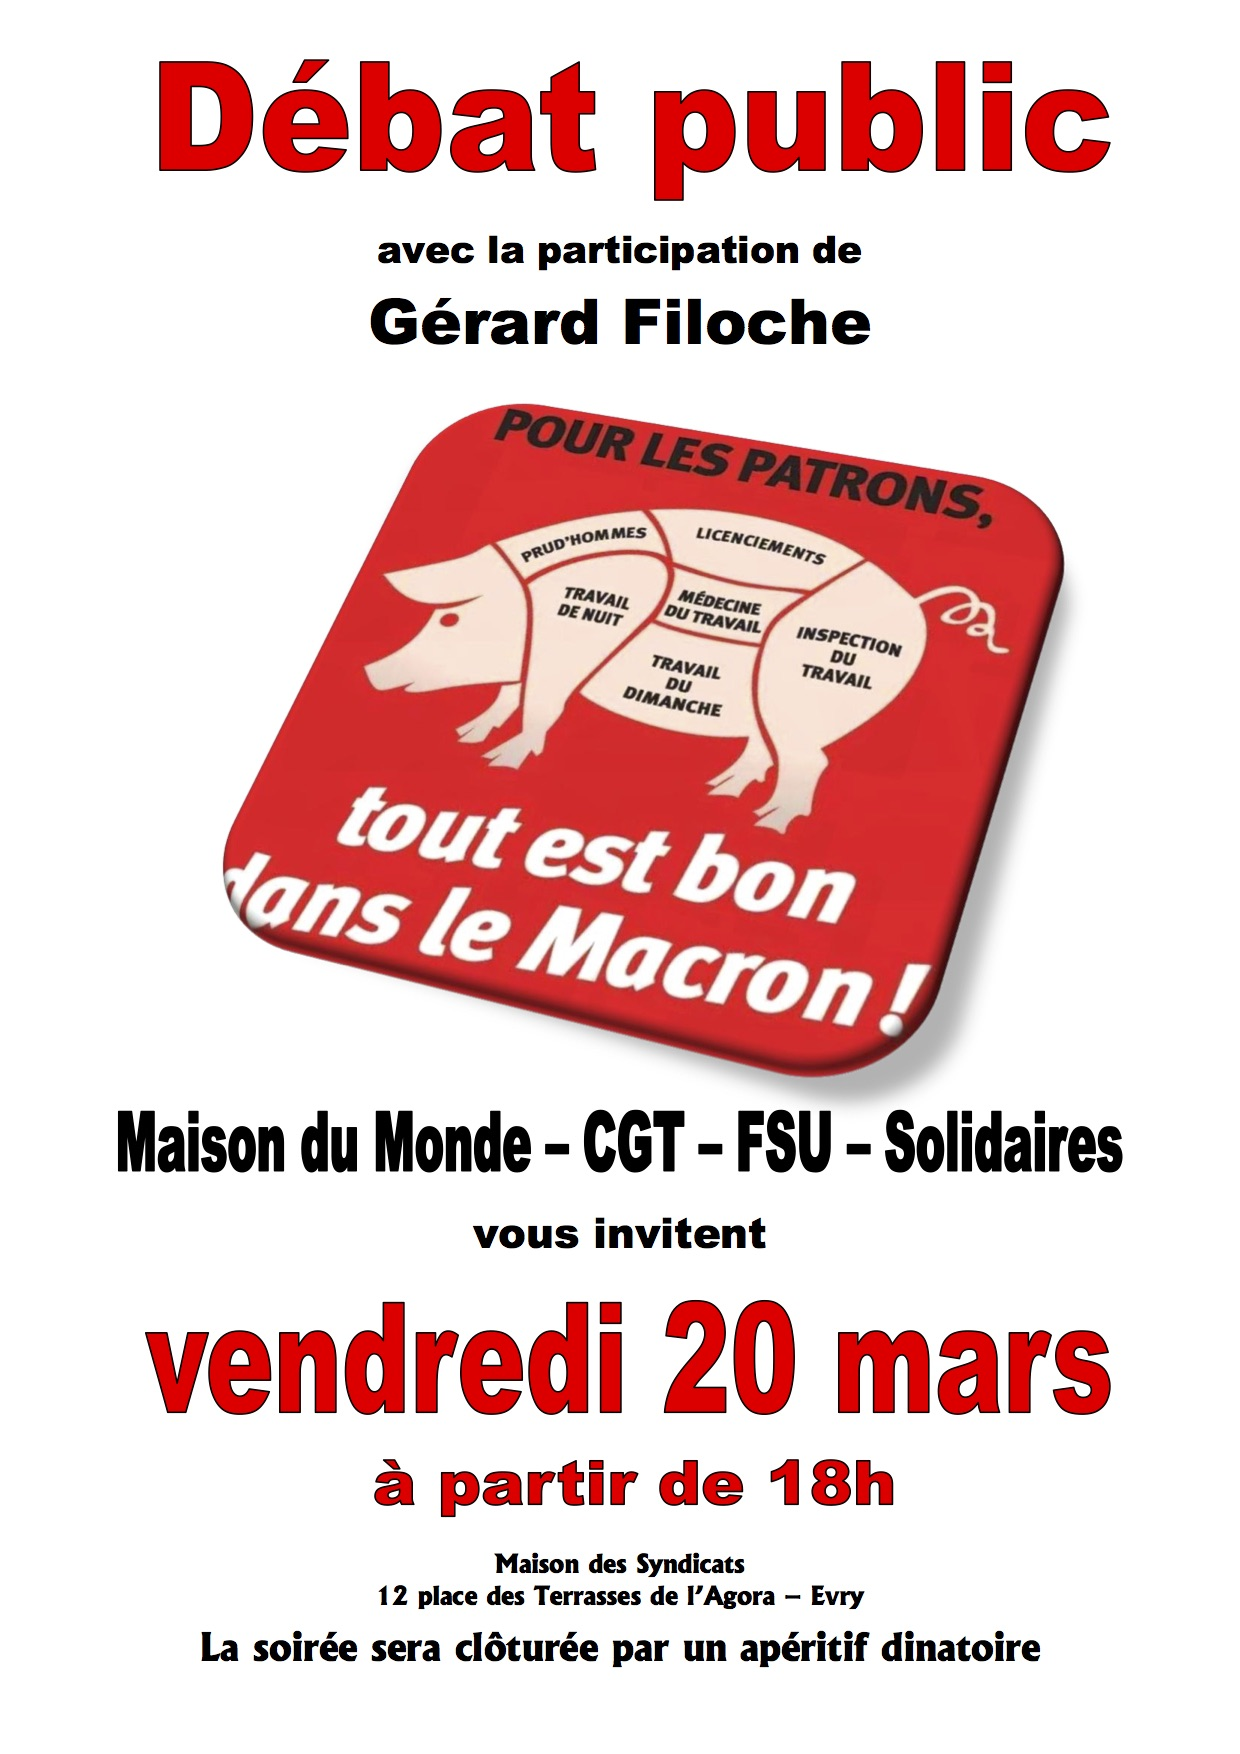 DEBAT PUBLIC 20mars15 Loi Macron